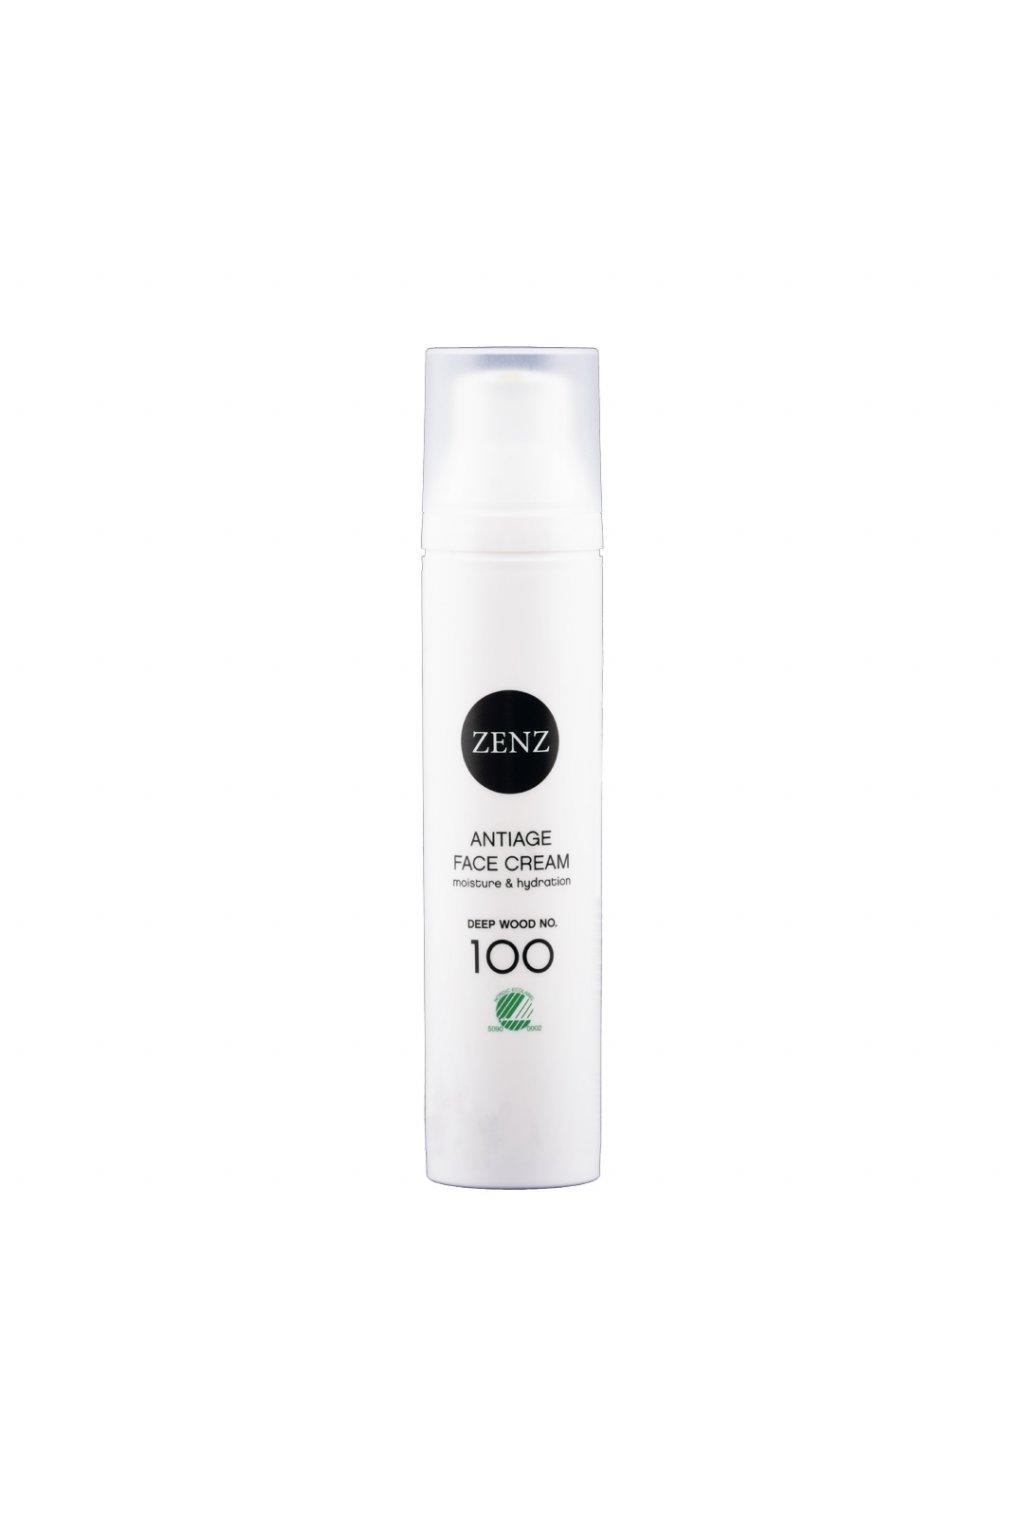 NO. 100 DEEP WOOD Antiage Face Cream